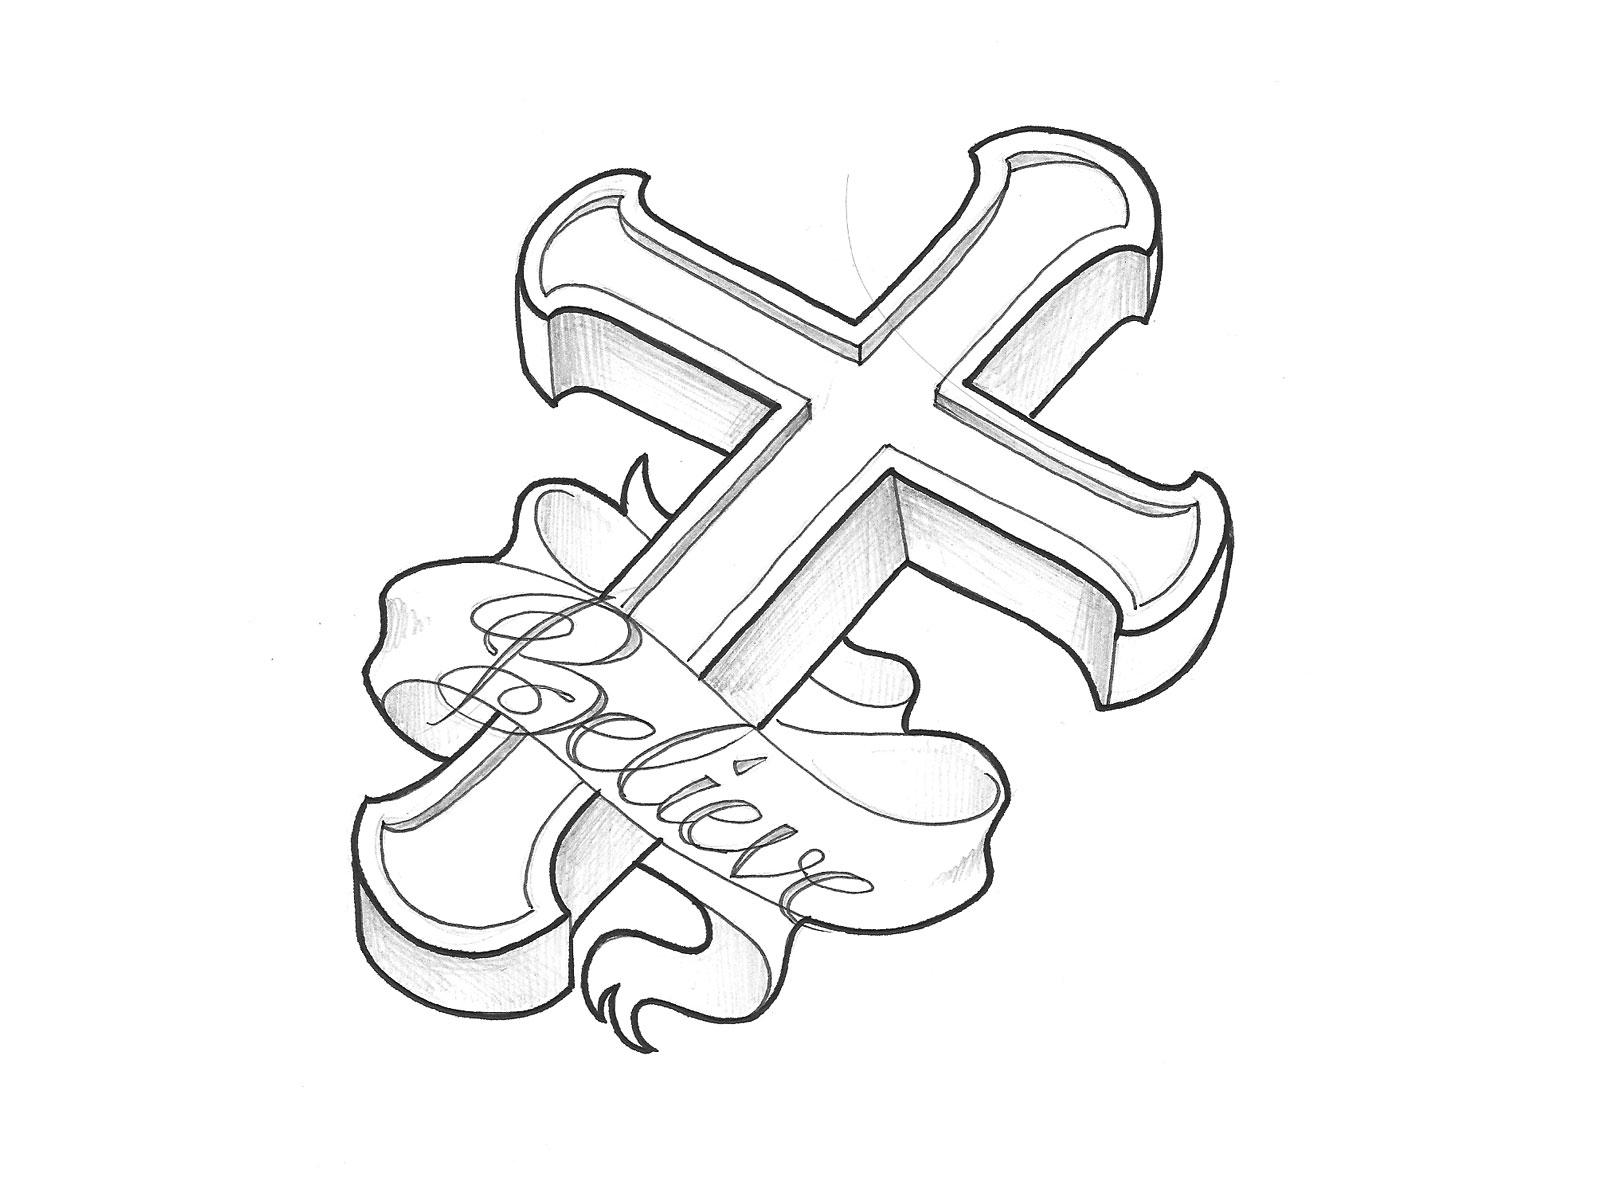 Wooden Cross Drawing At Getdrawings